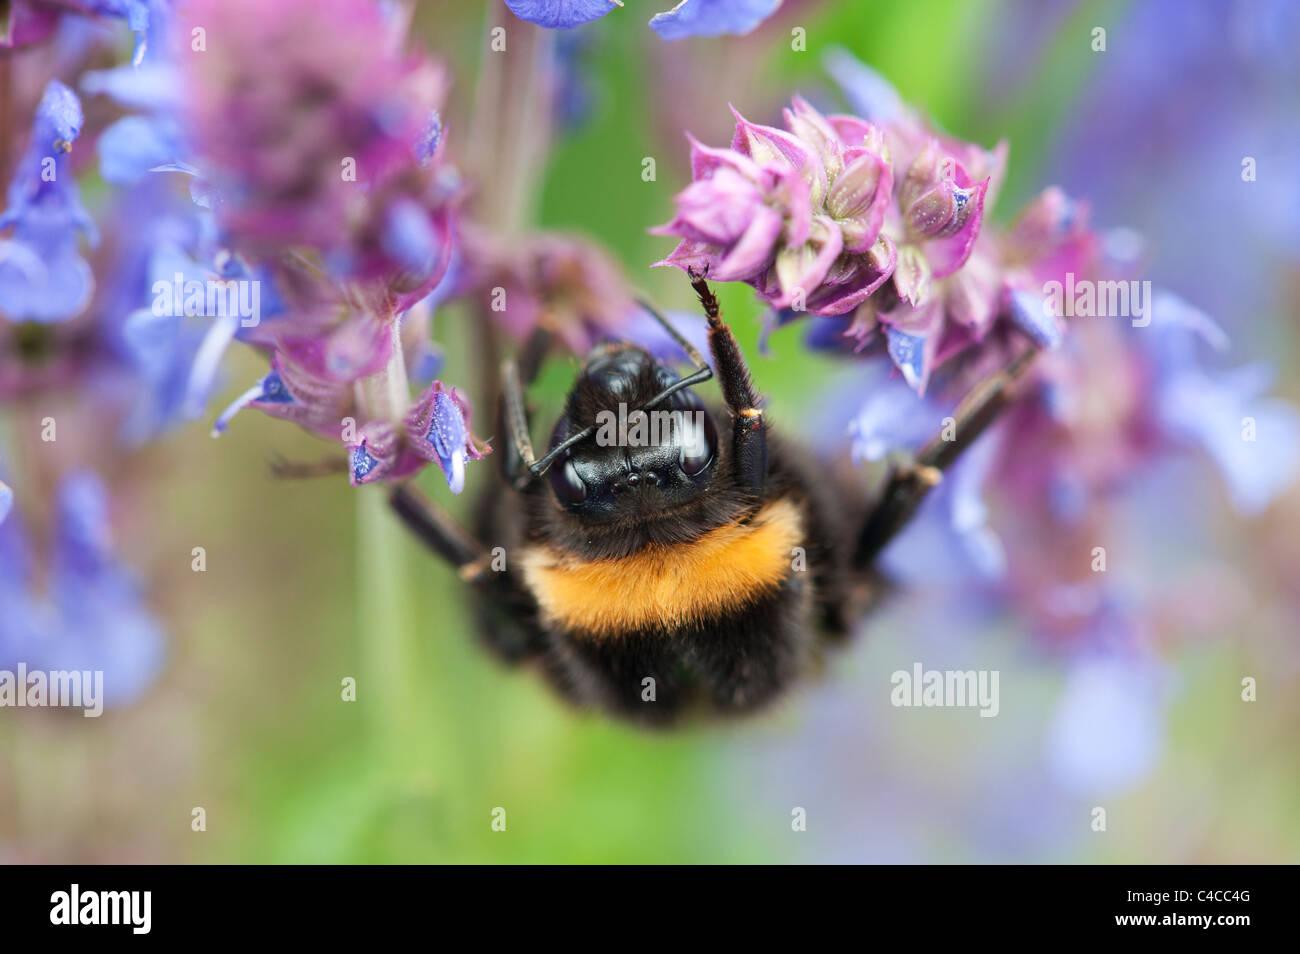 Bombus Lucorum. Bumble bee on a Salvia flower in an english garden Stock Photo